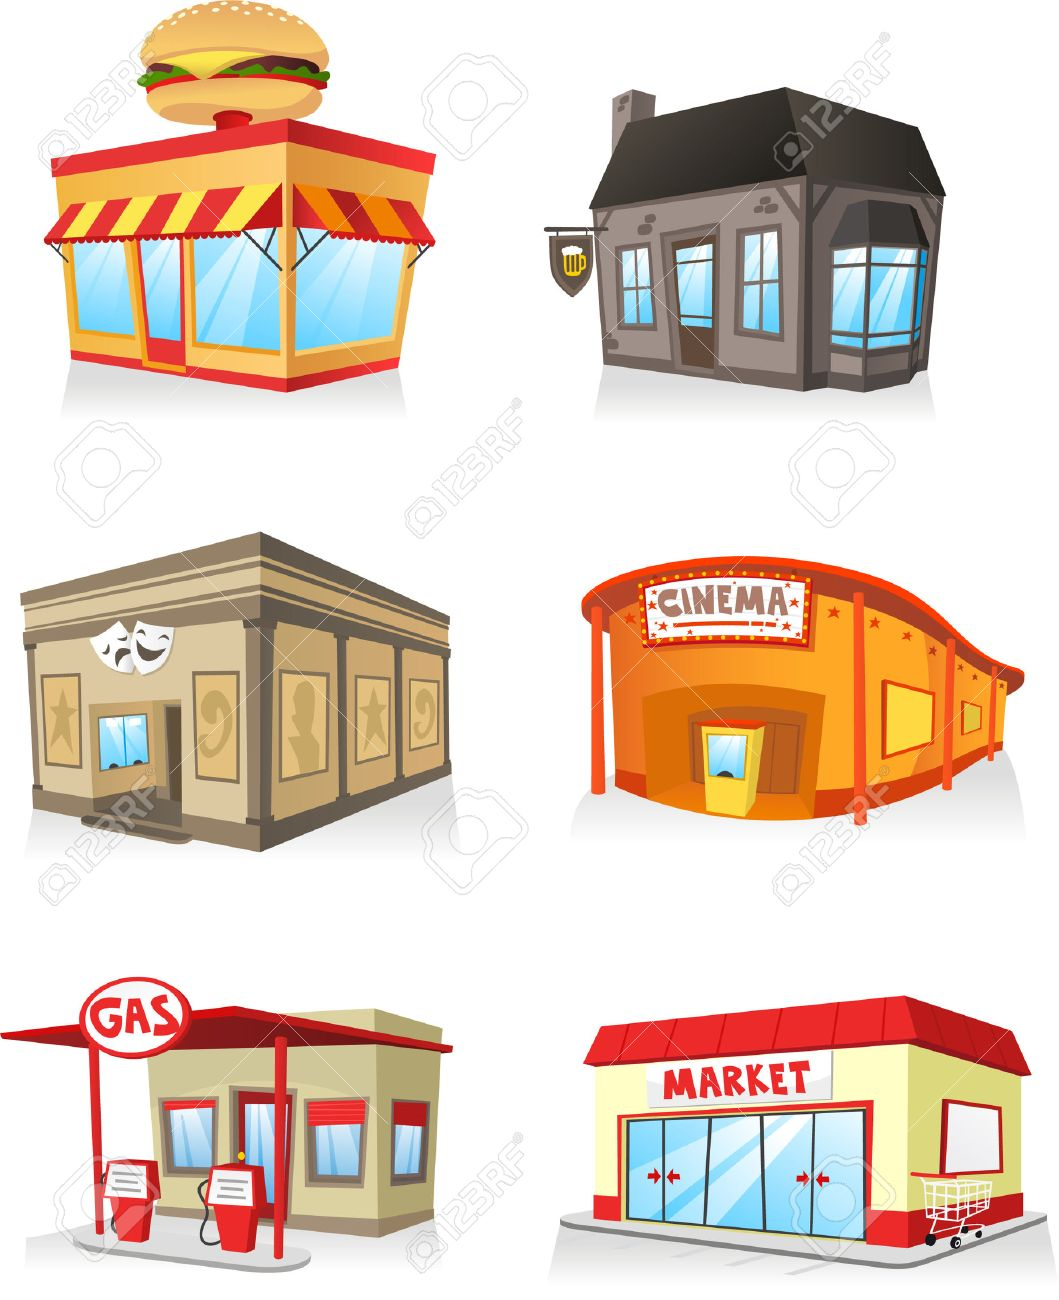 Building cartoon clipart restaurant building and restaurant building - Public Building Cartoon Set Fast Food Restaurant Cinema Gas Station Theatre